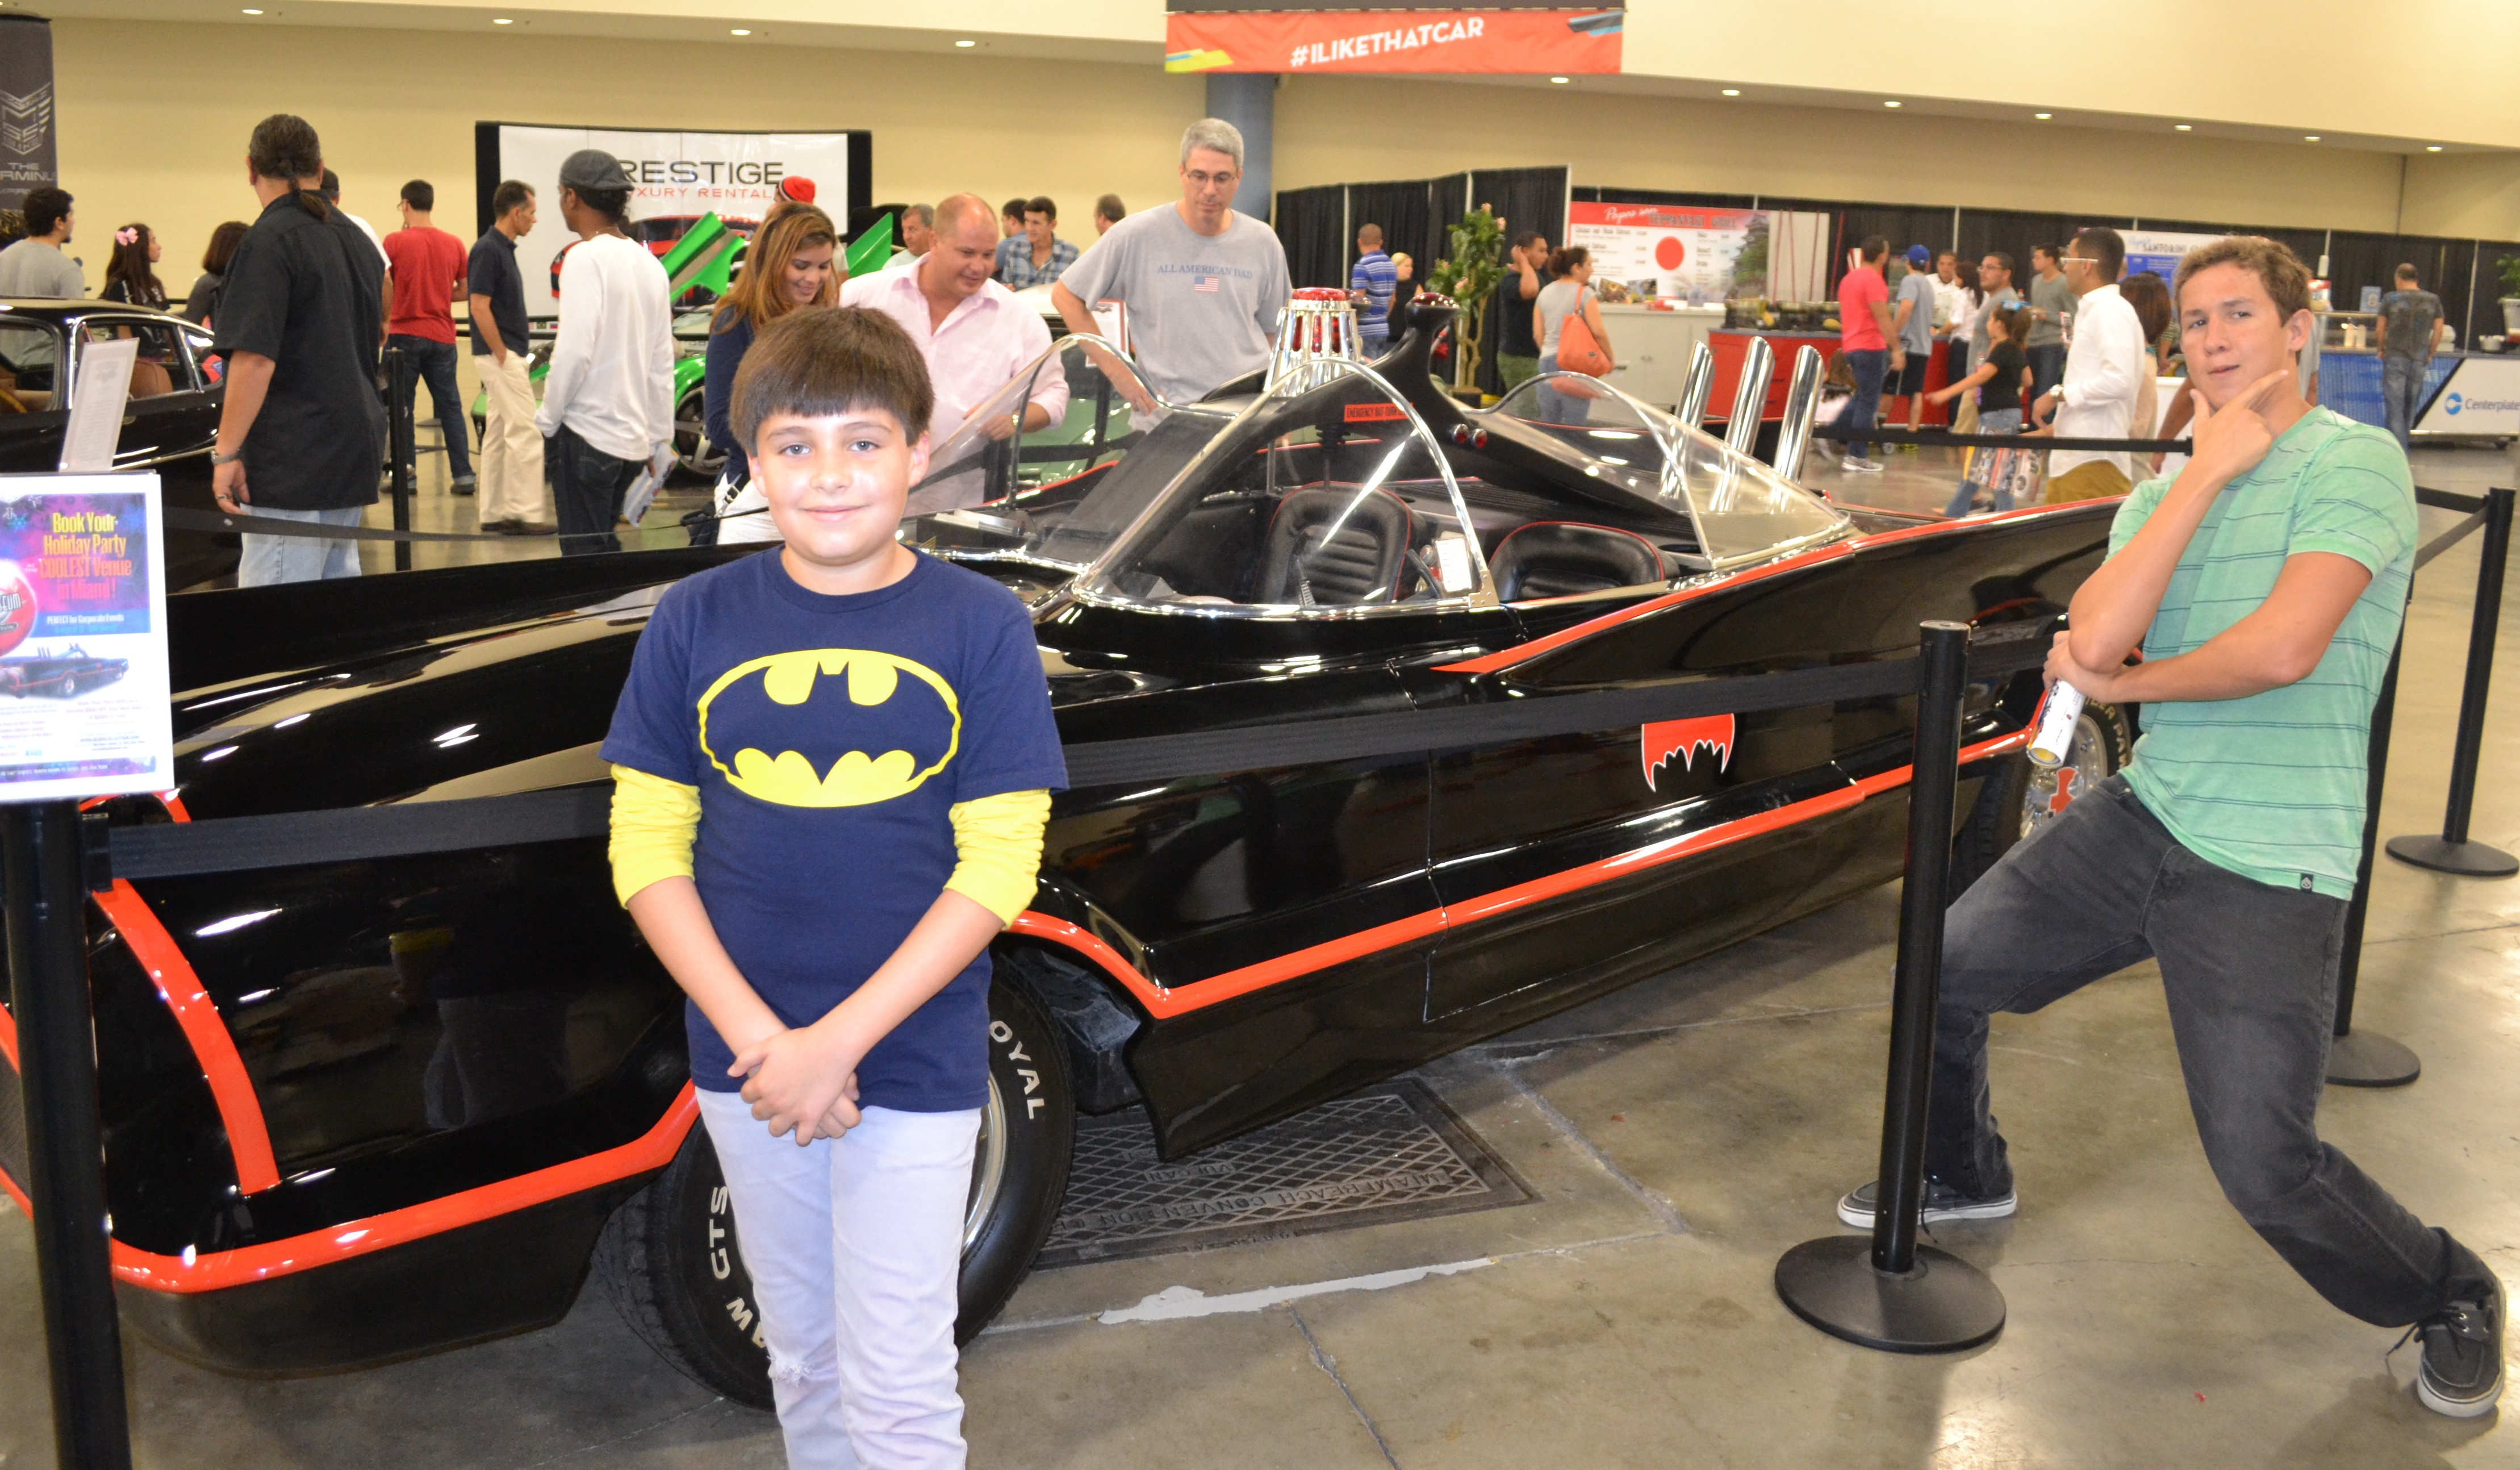 Miami Auto Show >> The New Generation Of Car Aficionados At The Miami Auto Show